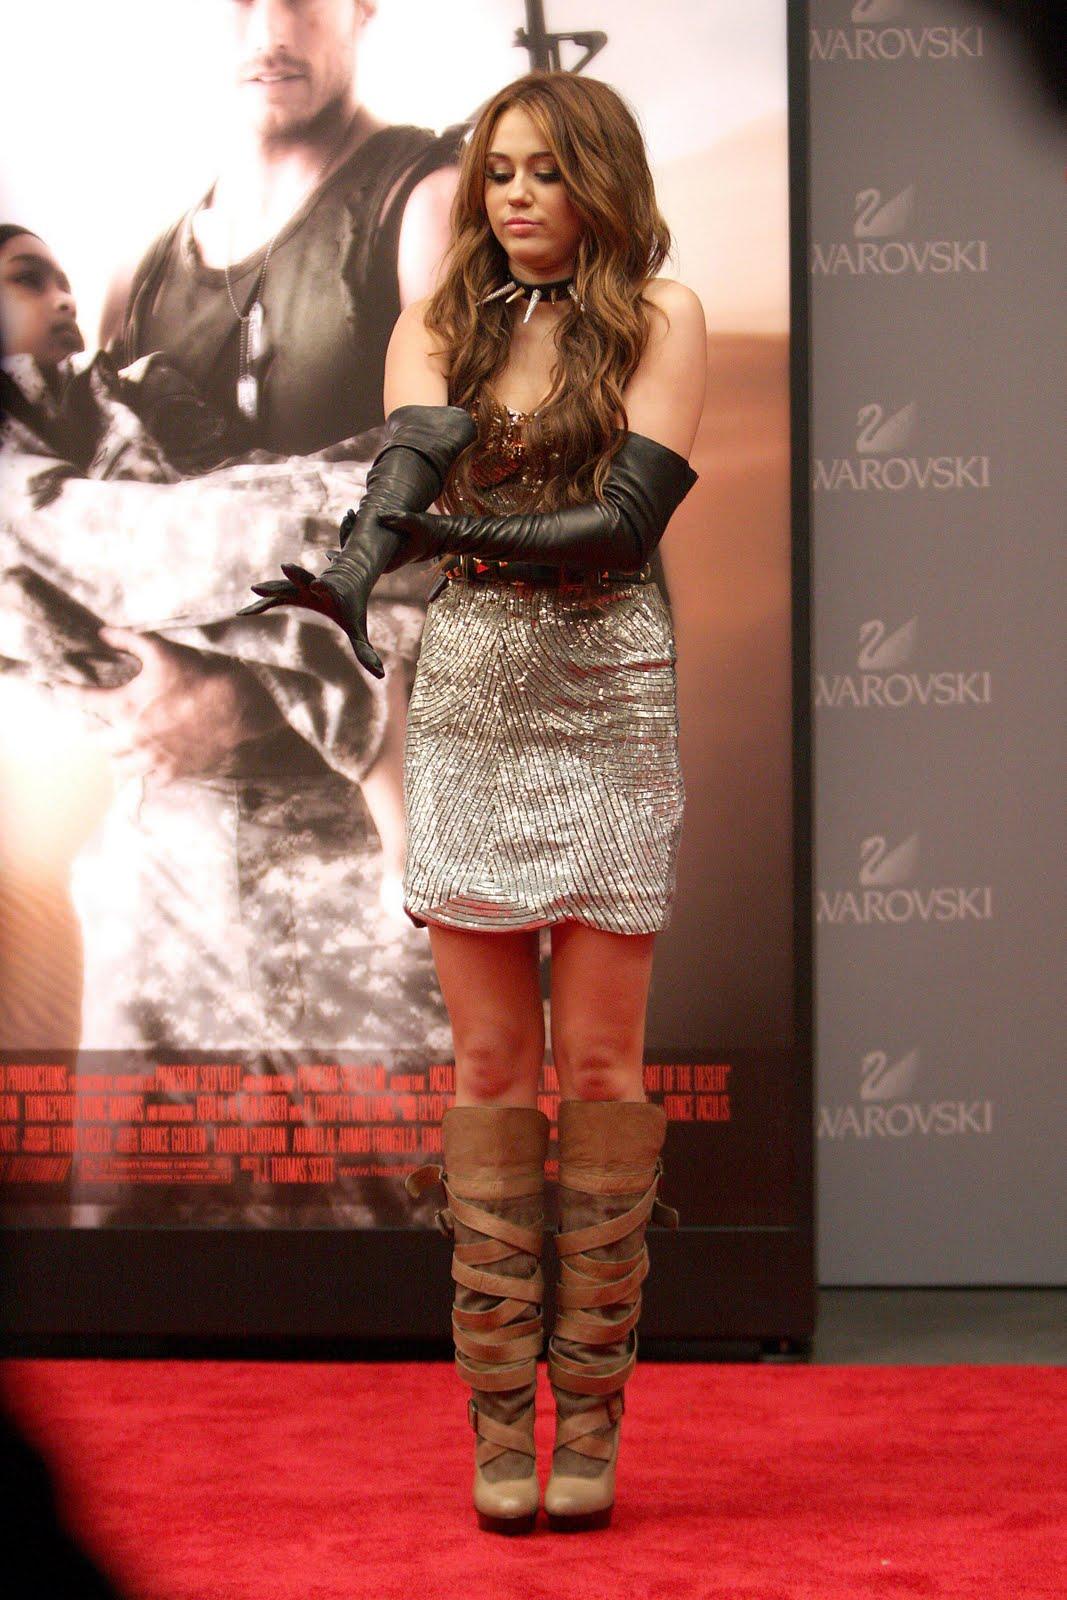 Leather Fasyen Miley Cyrus Leather 2 Uhq